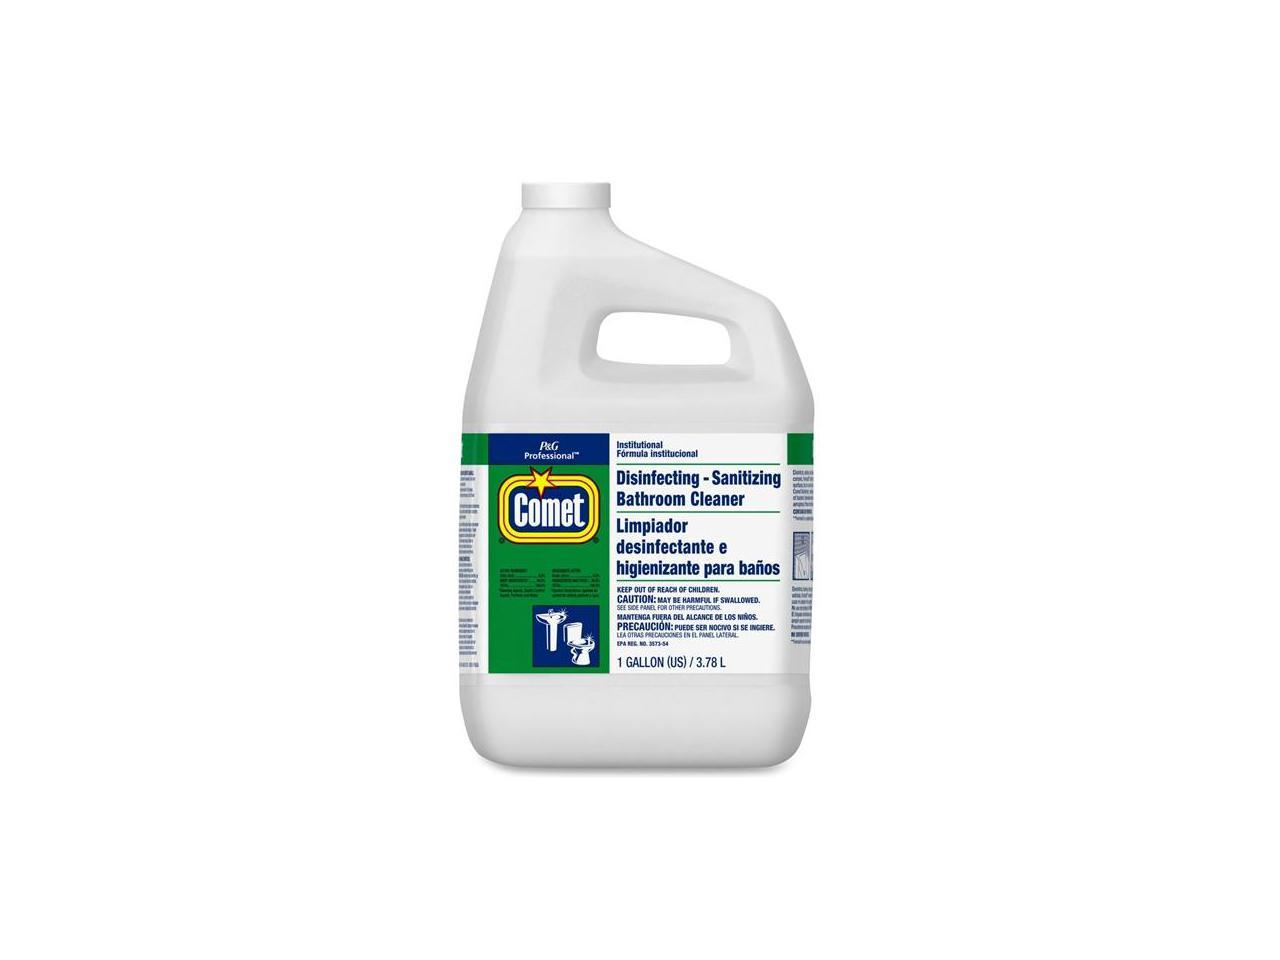 Procter Gamble 1106 Comet Professional Line Liquid Disinfectant Bathroom Cleaner 3 Bottles Per Carton Newegg Com